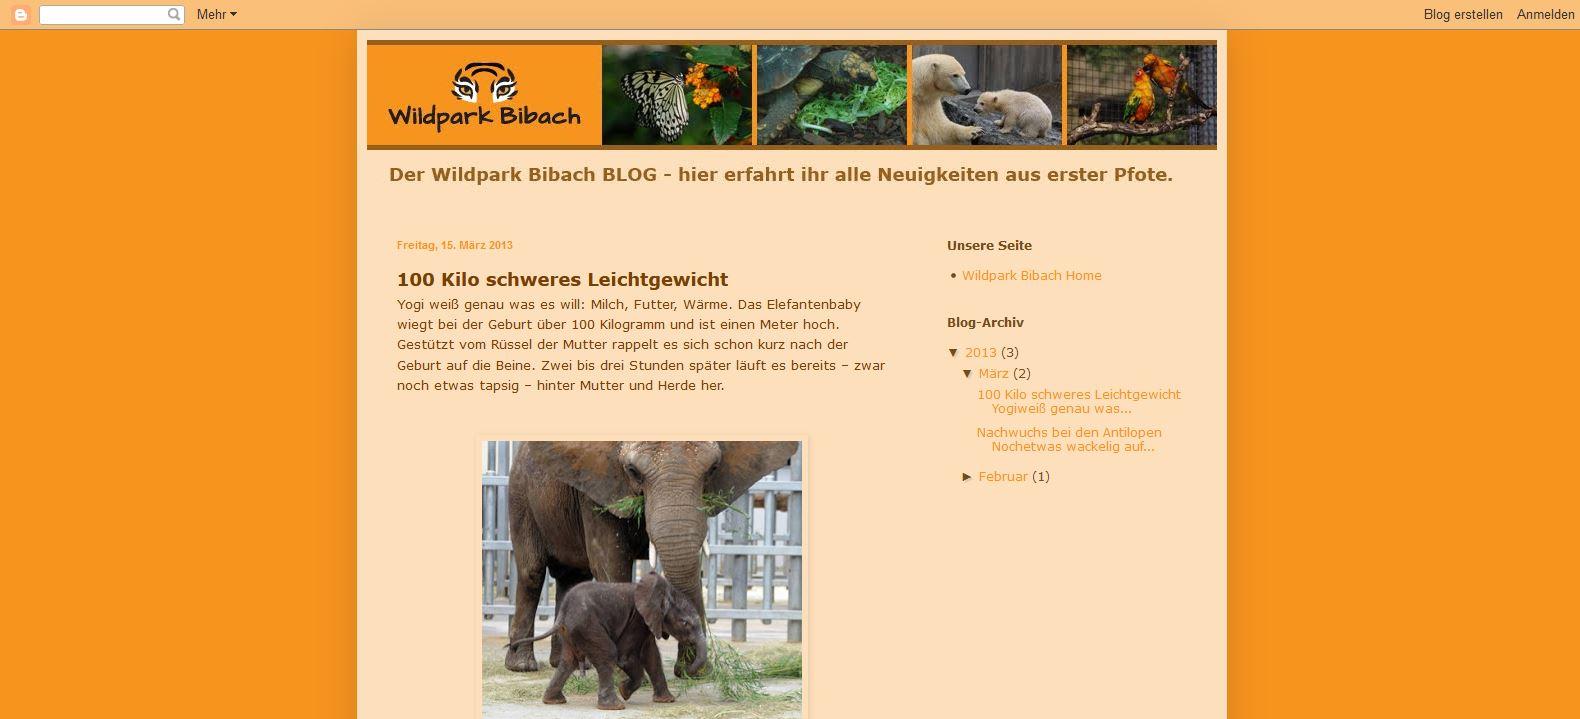 Wildpark Bibach - Aktuelles (Blog)